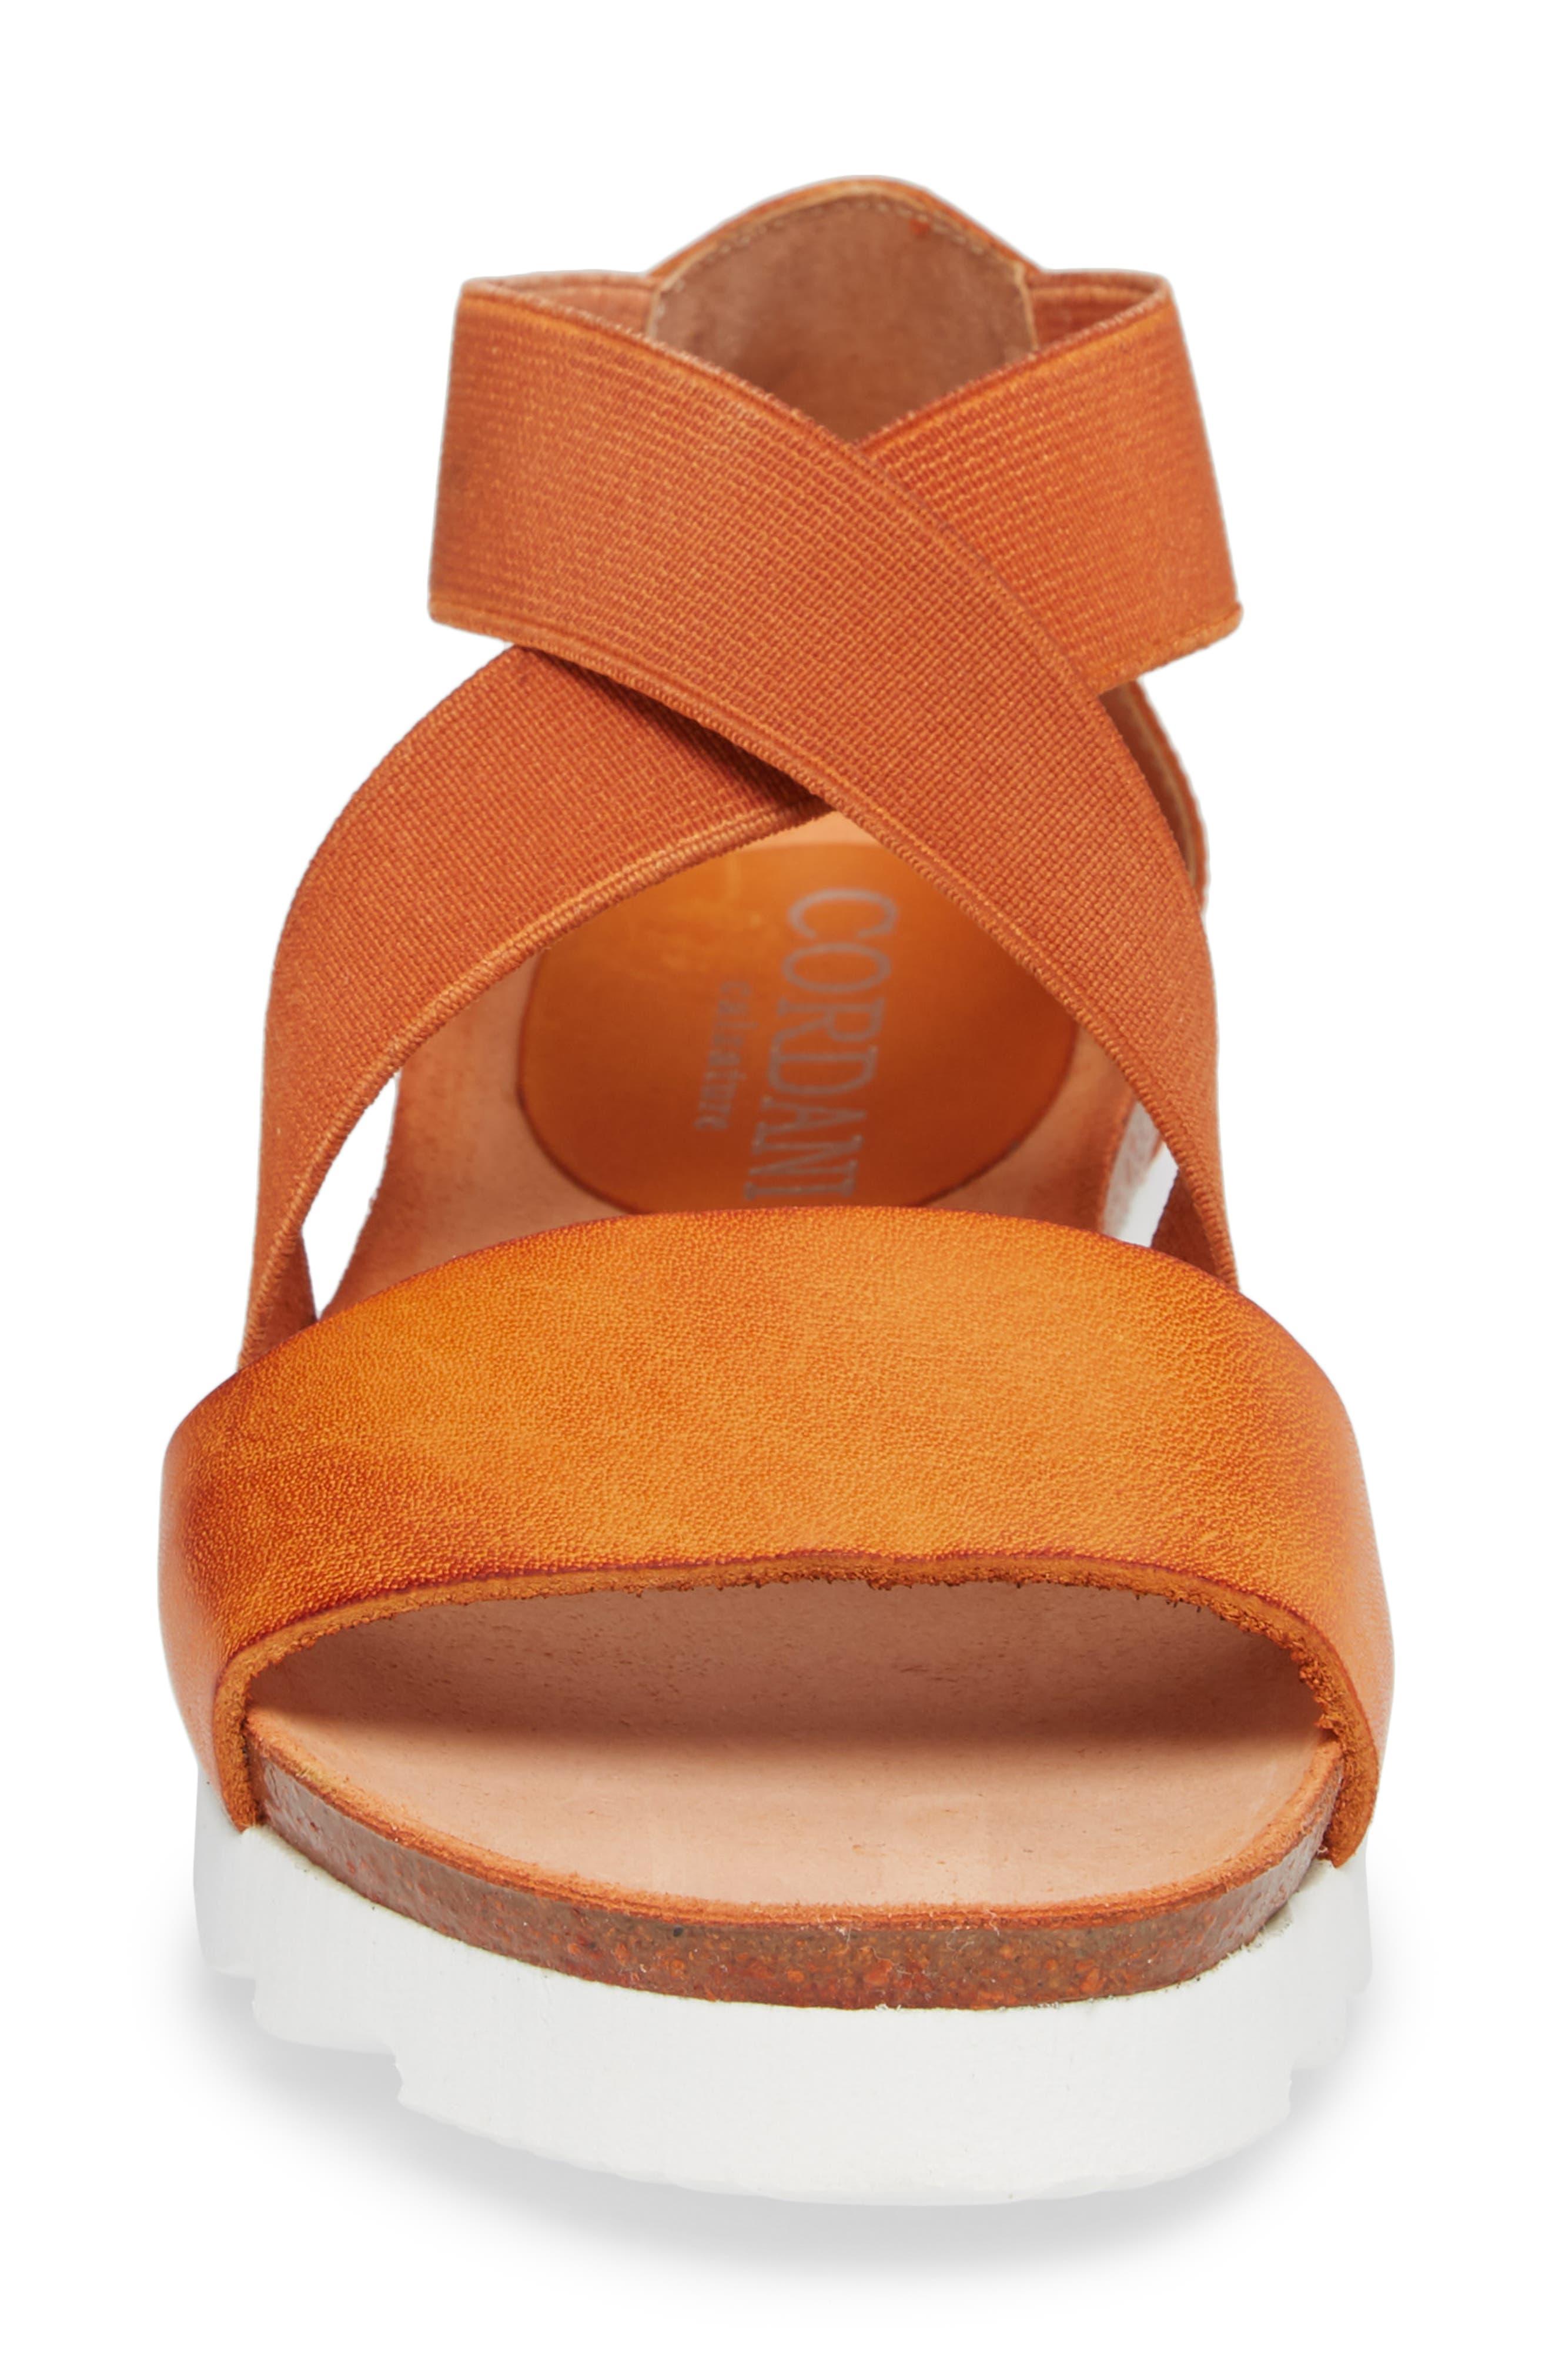 Sayger Sandal,                             Alternate thumbnail 4, color,                             Orange Leather